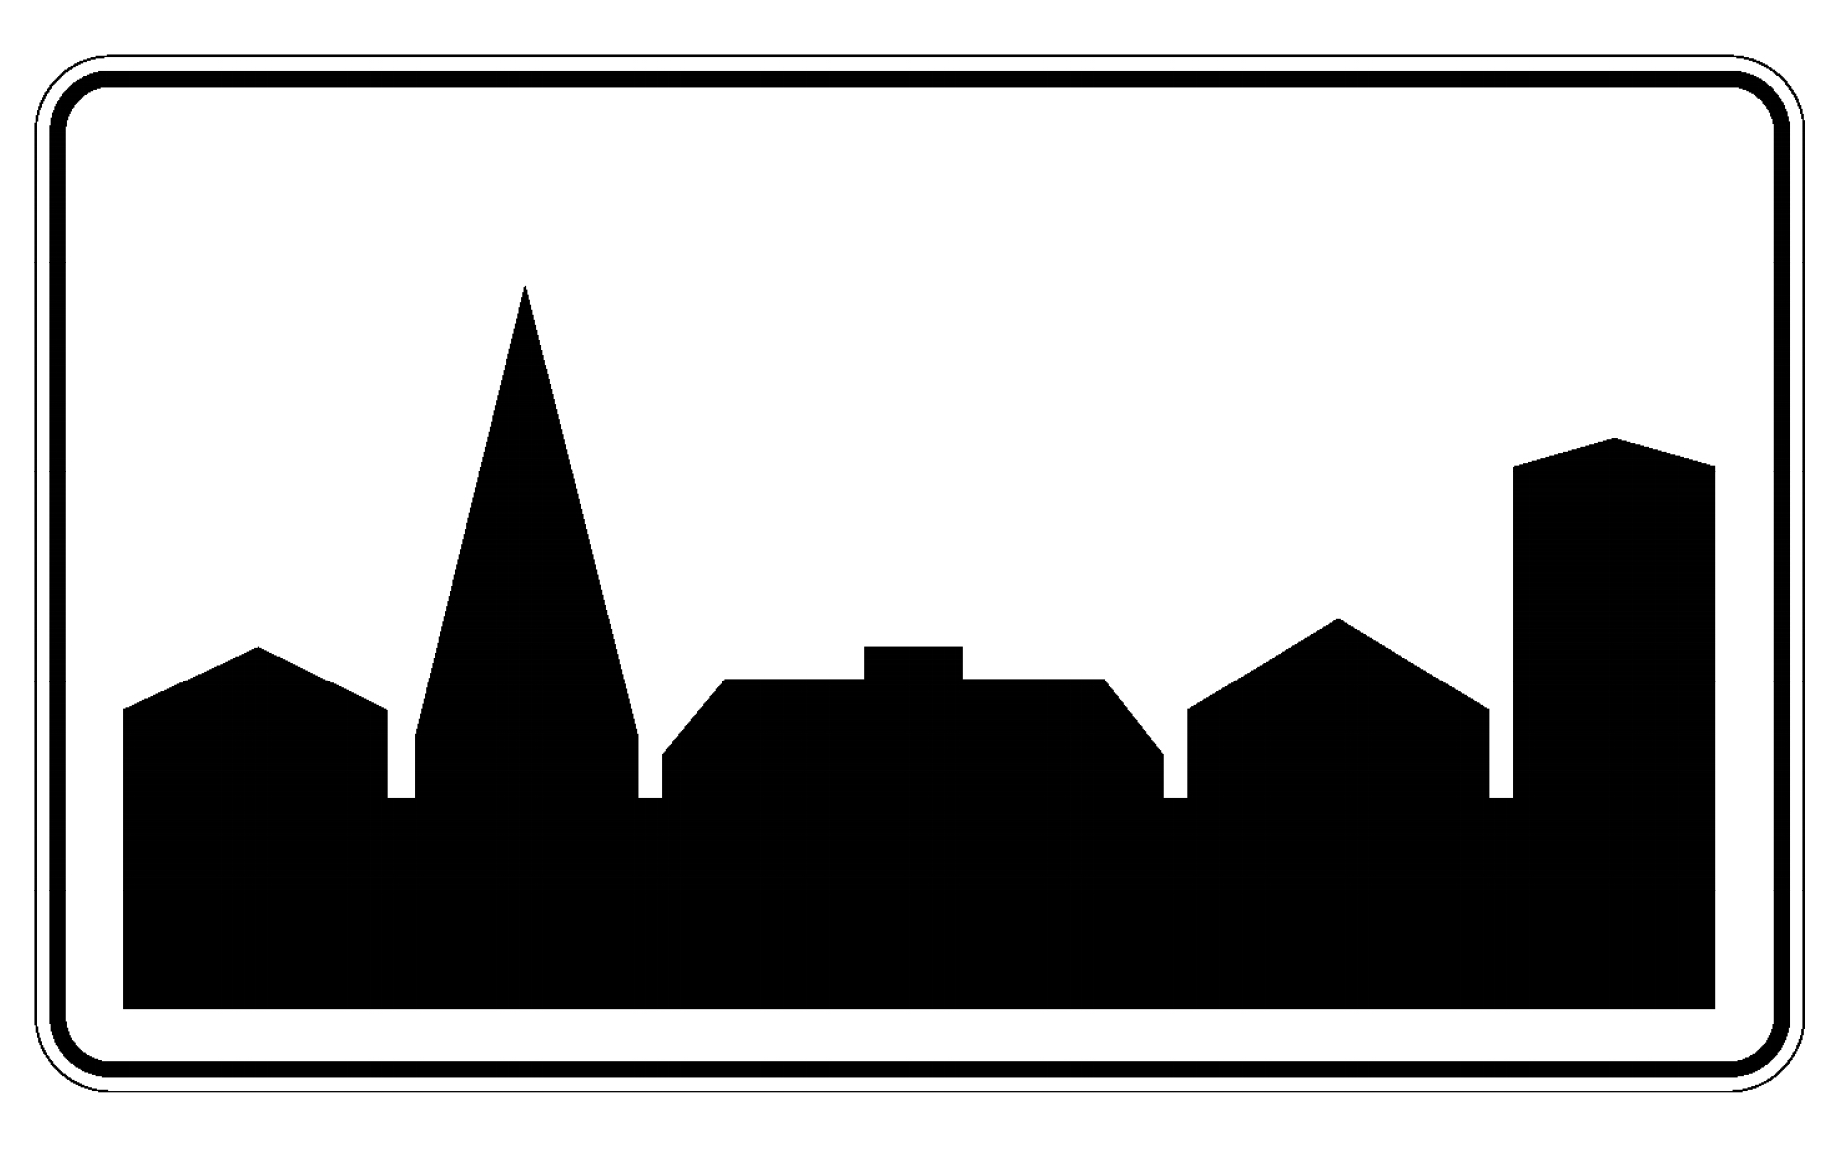 Znak obszar zabudowany